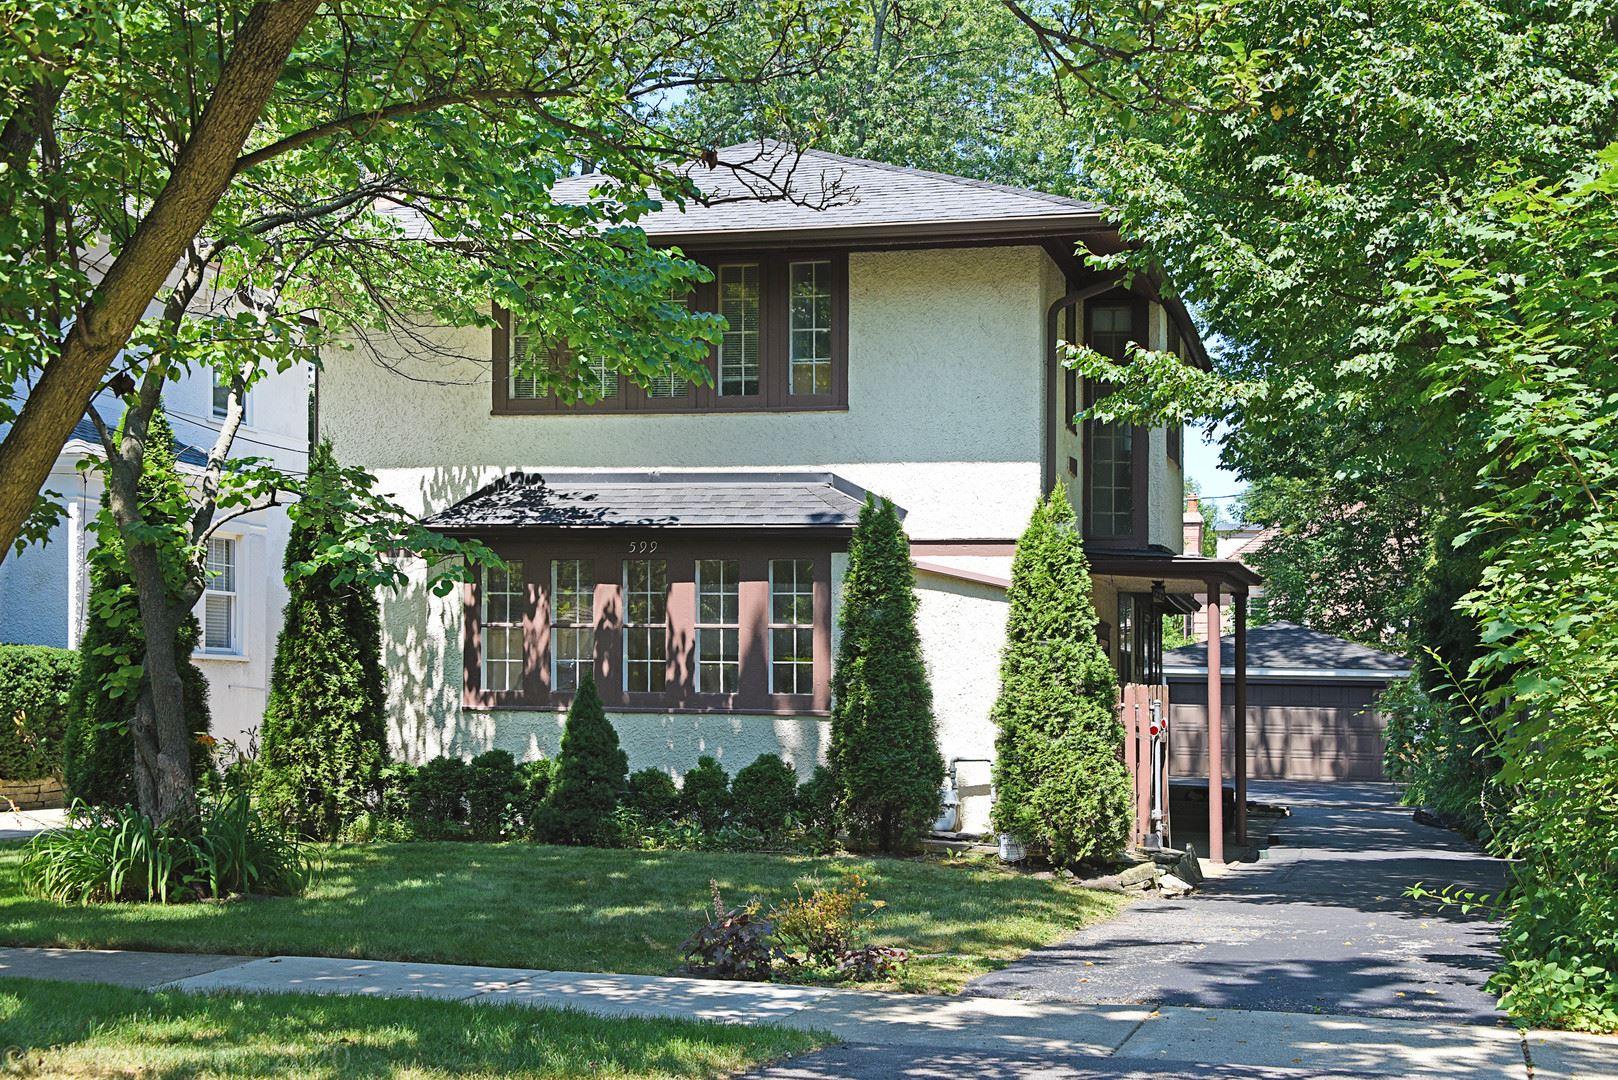 599 Orchard Lane, Winnetka, IL 60093 - #: 10812030